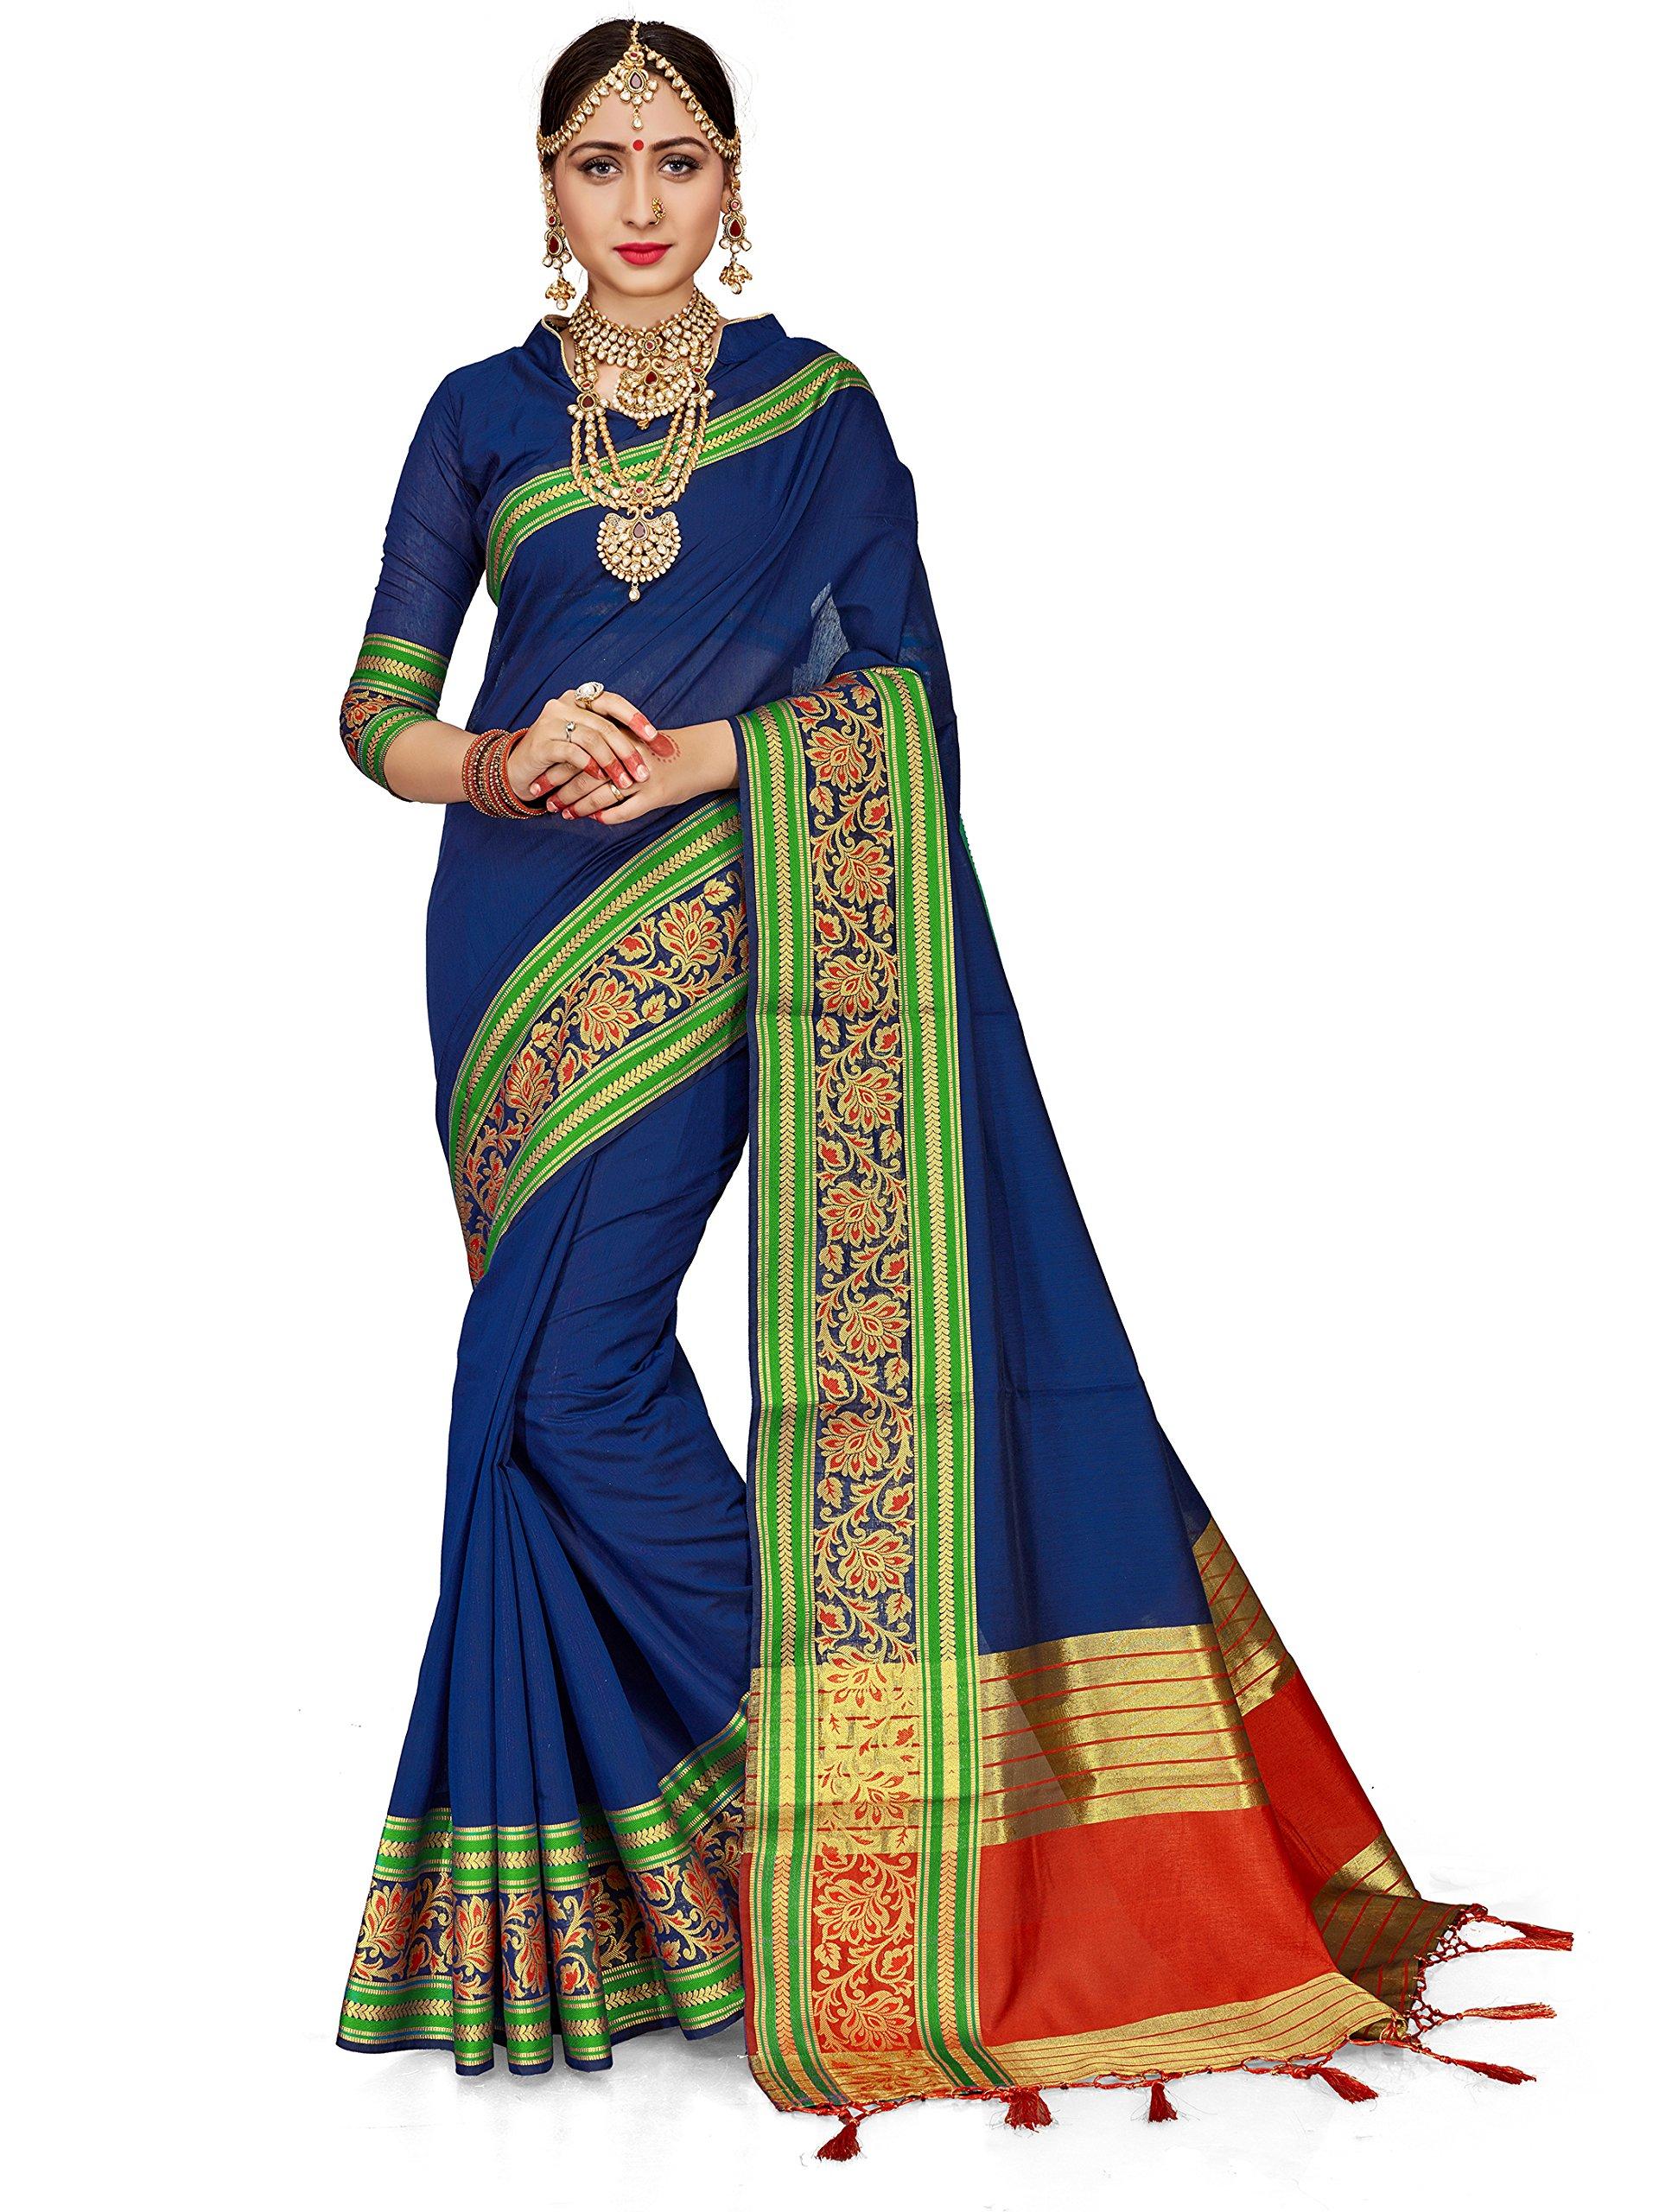 ELINA FASHION Sarees Women Cotton Silk Woven Saree l Indian Wedding Wear Sari Unstitched Blouse (Royal Blue 1)